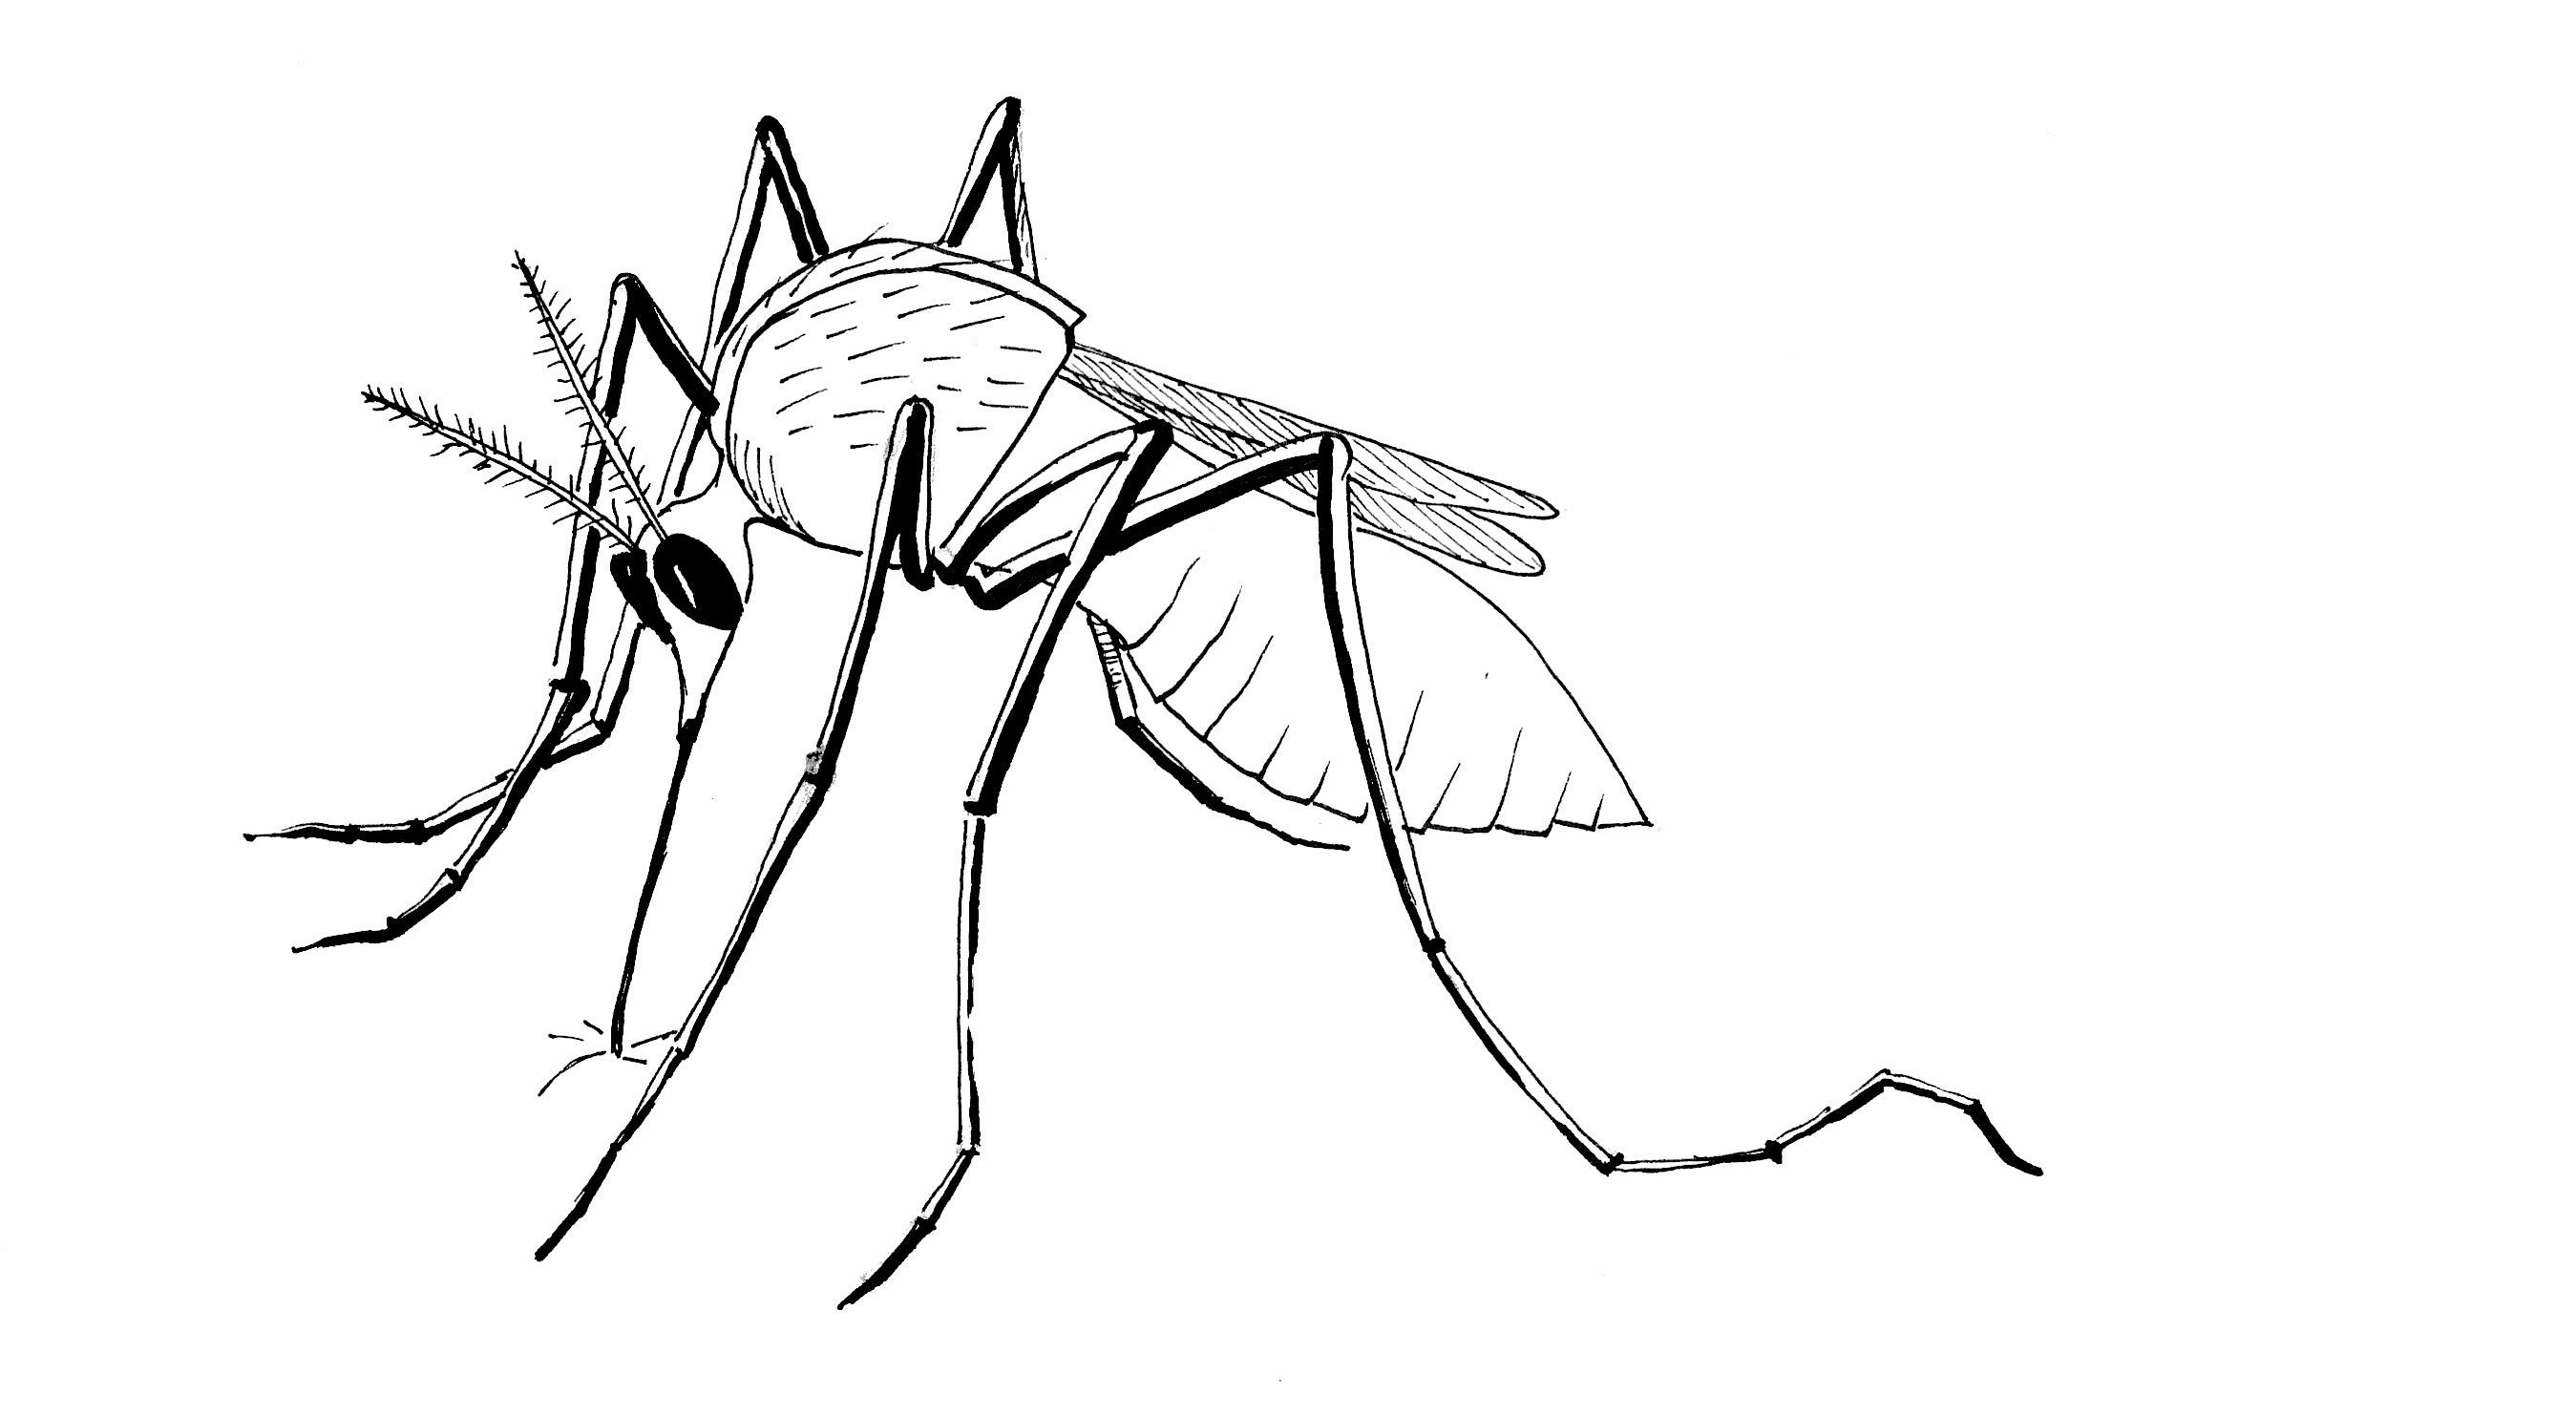 Virus Drawing At Getdrawings